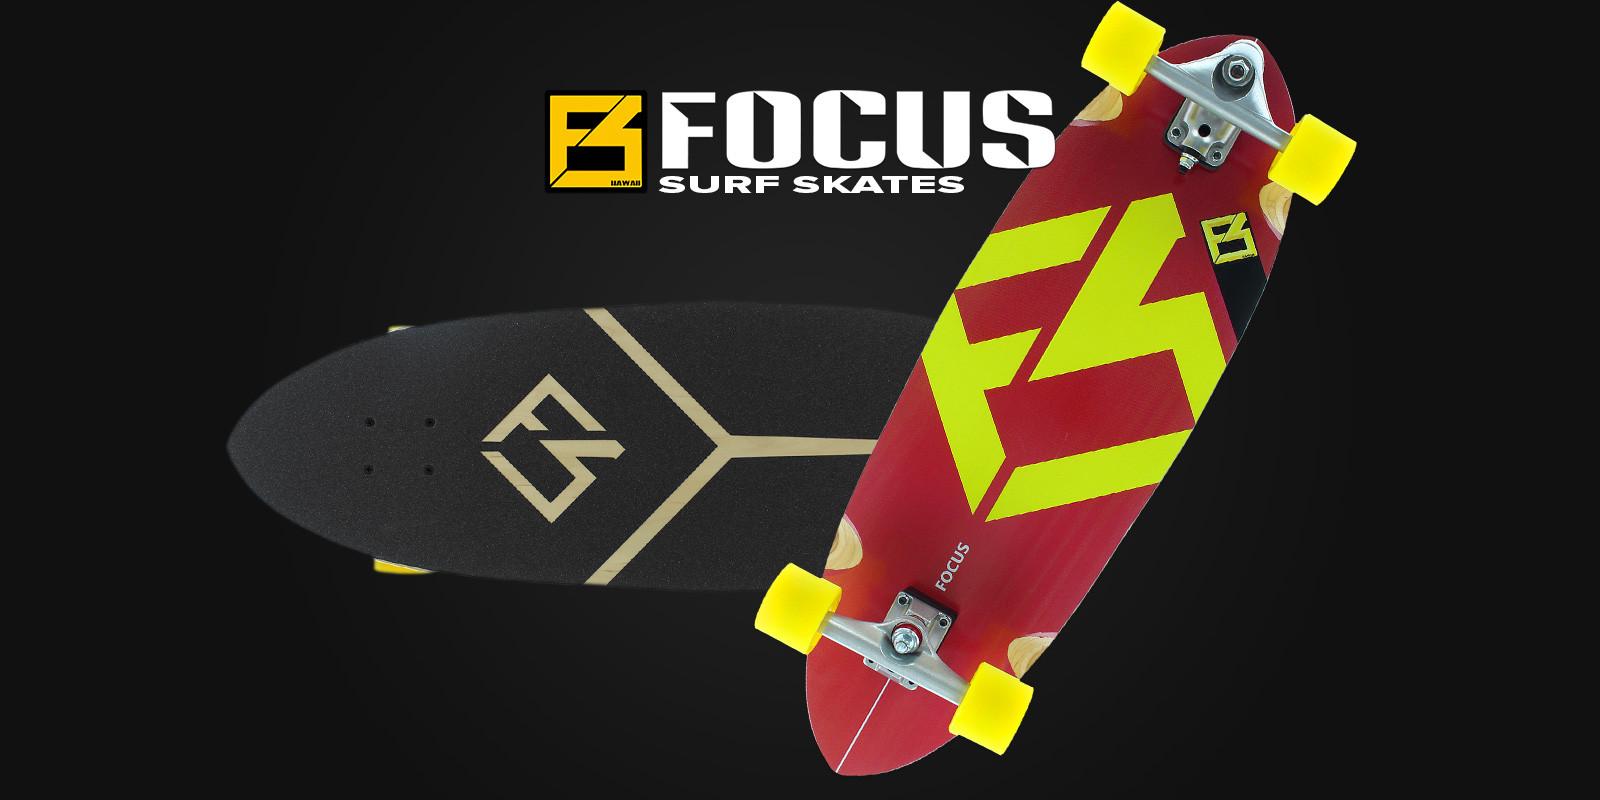 FOCUS SUP Surf Skates